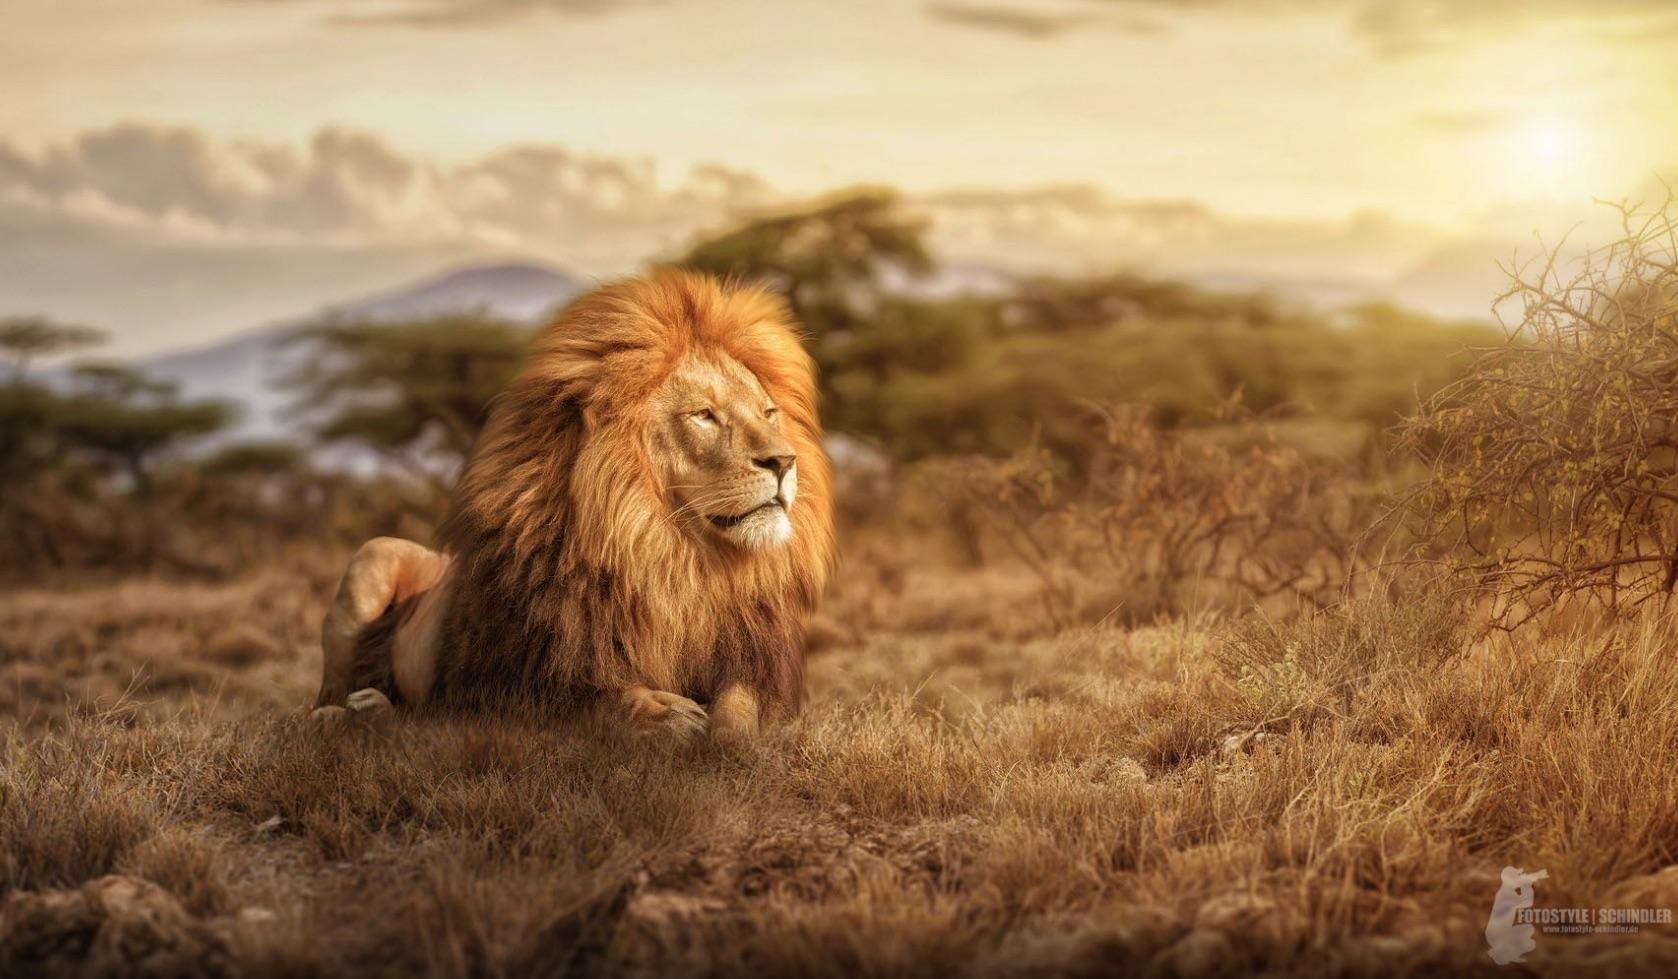 Majestic Lion - Tagi Video Image reference database